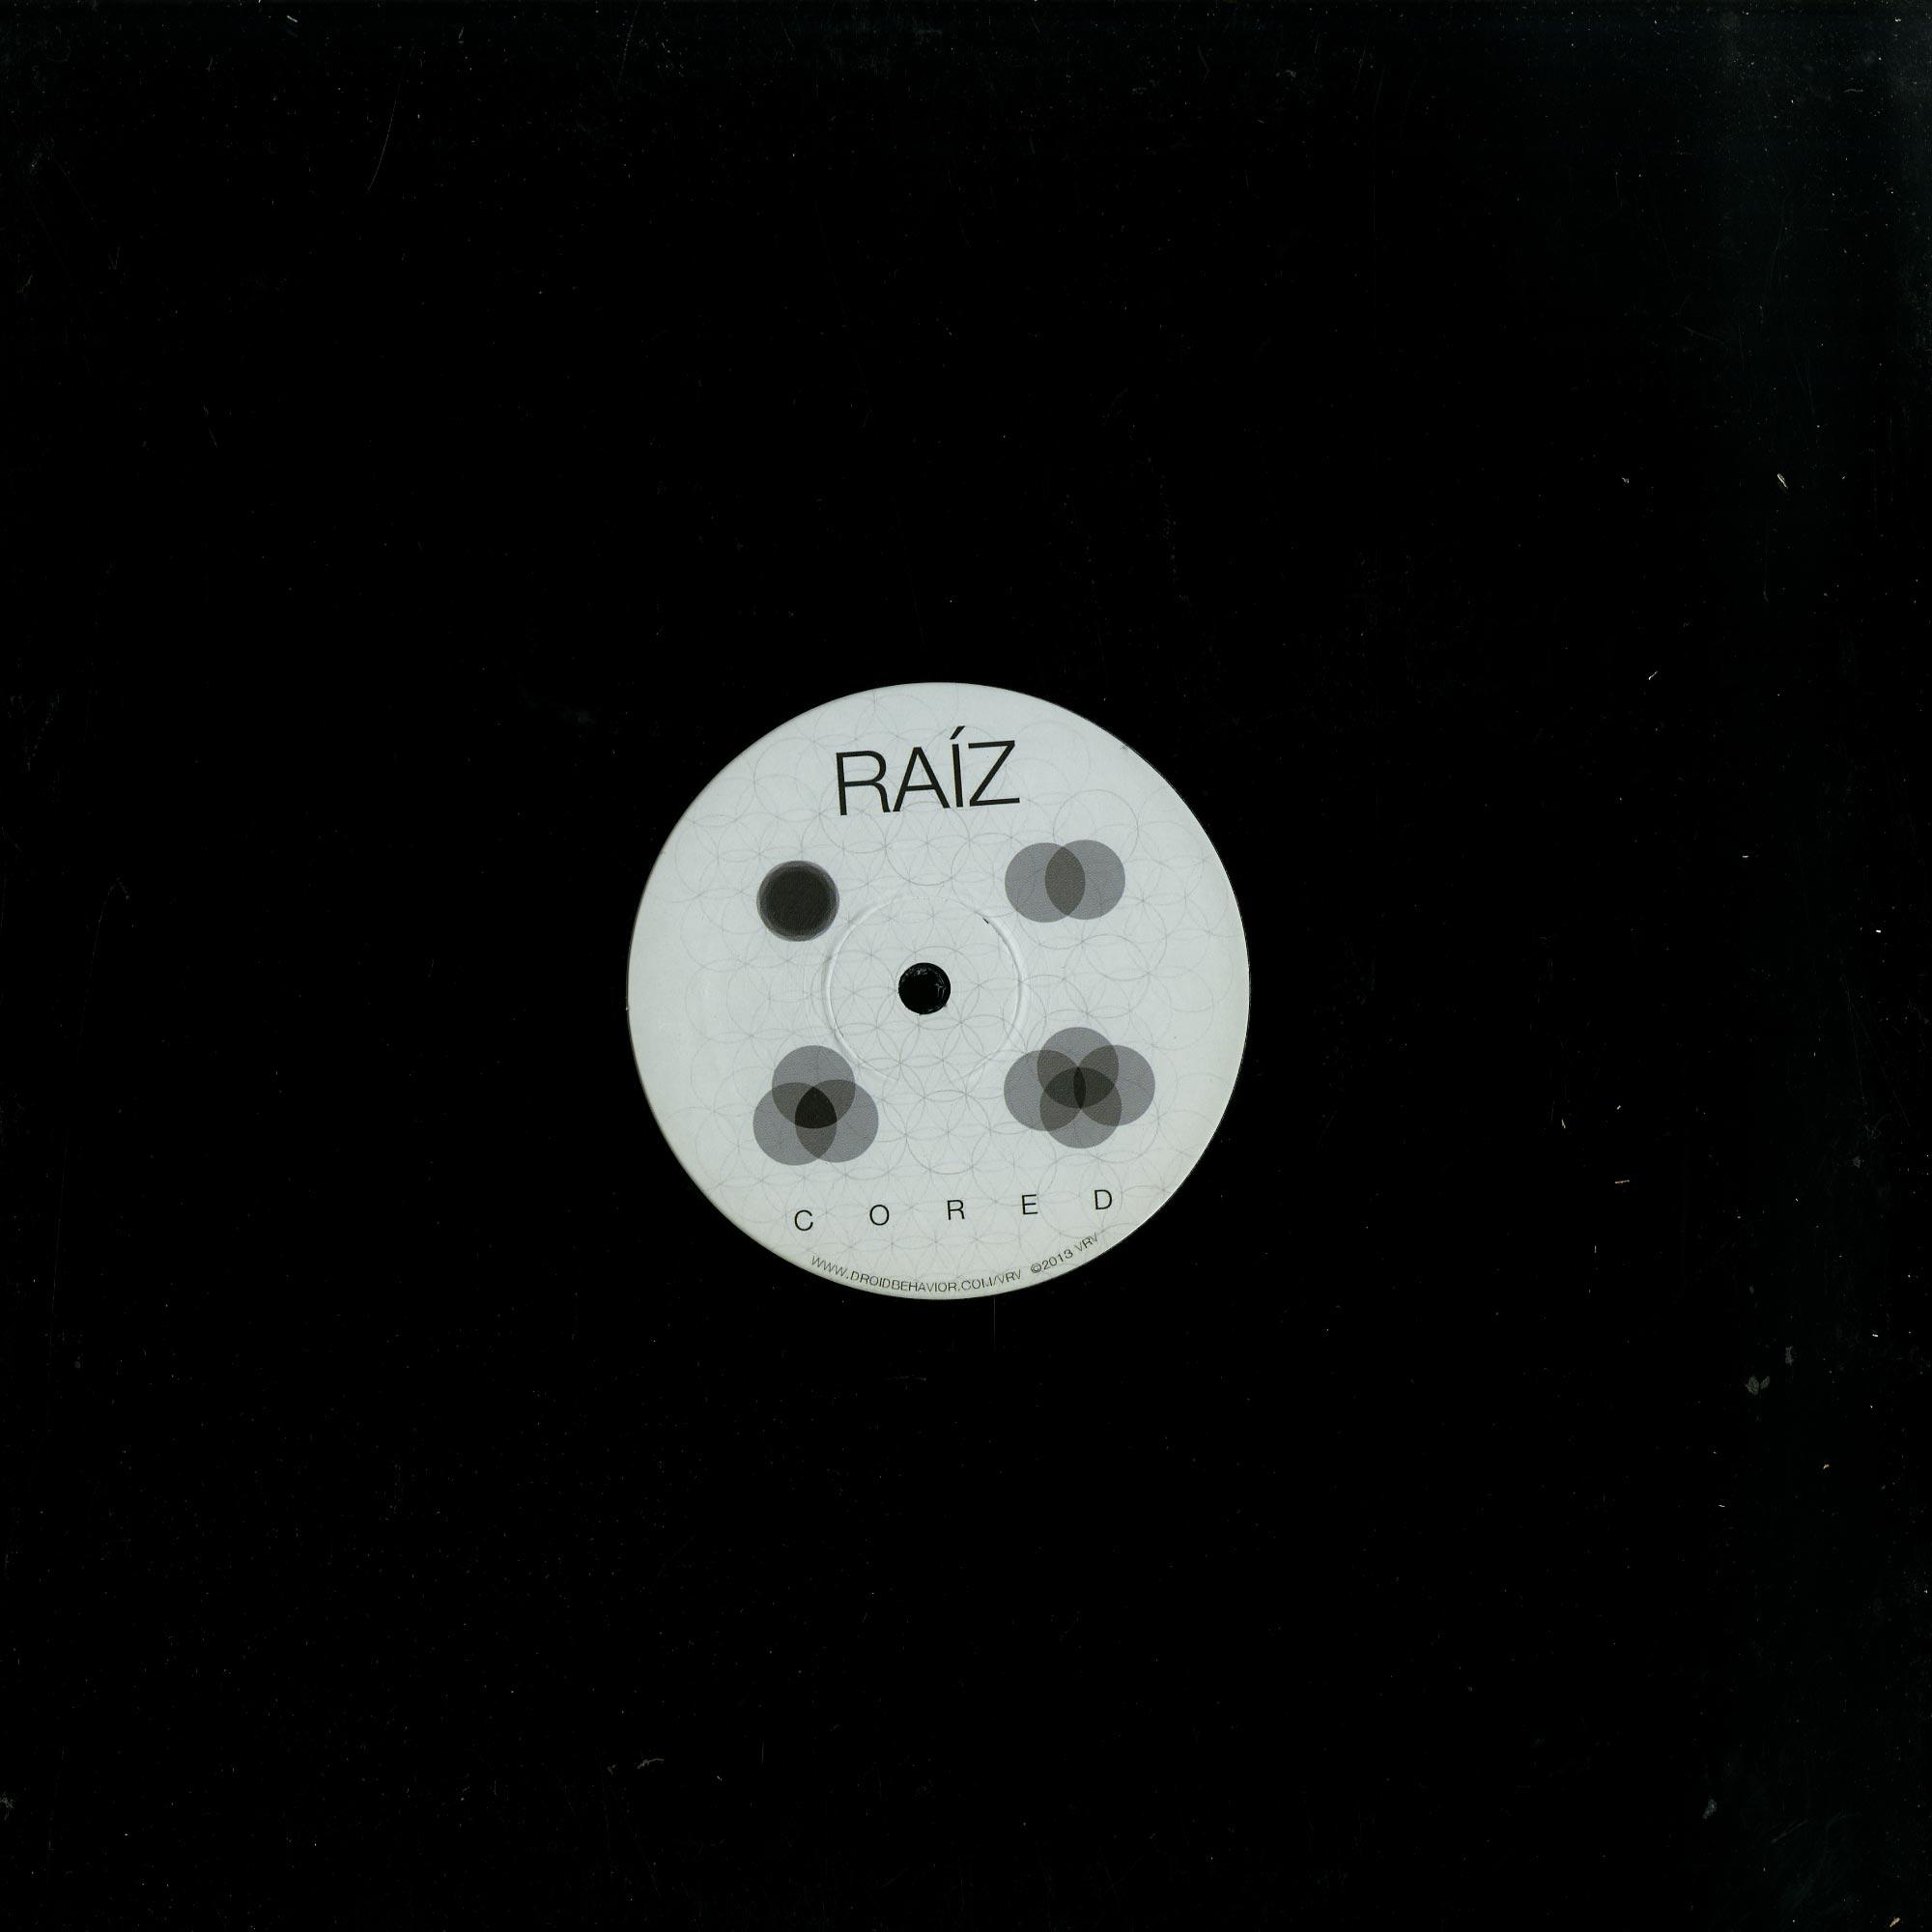 Raiz - CORED